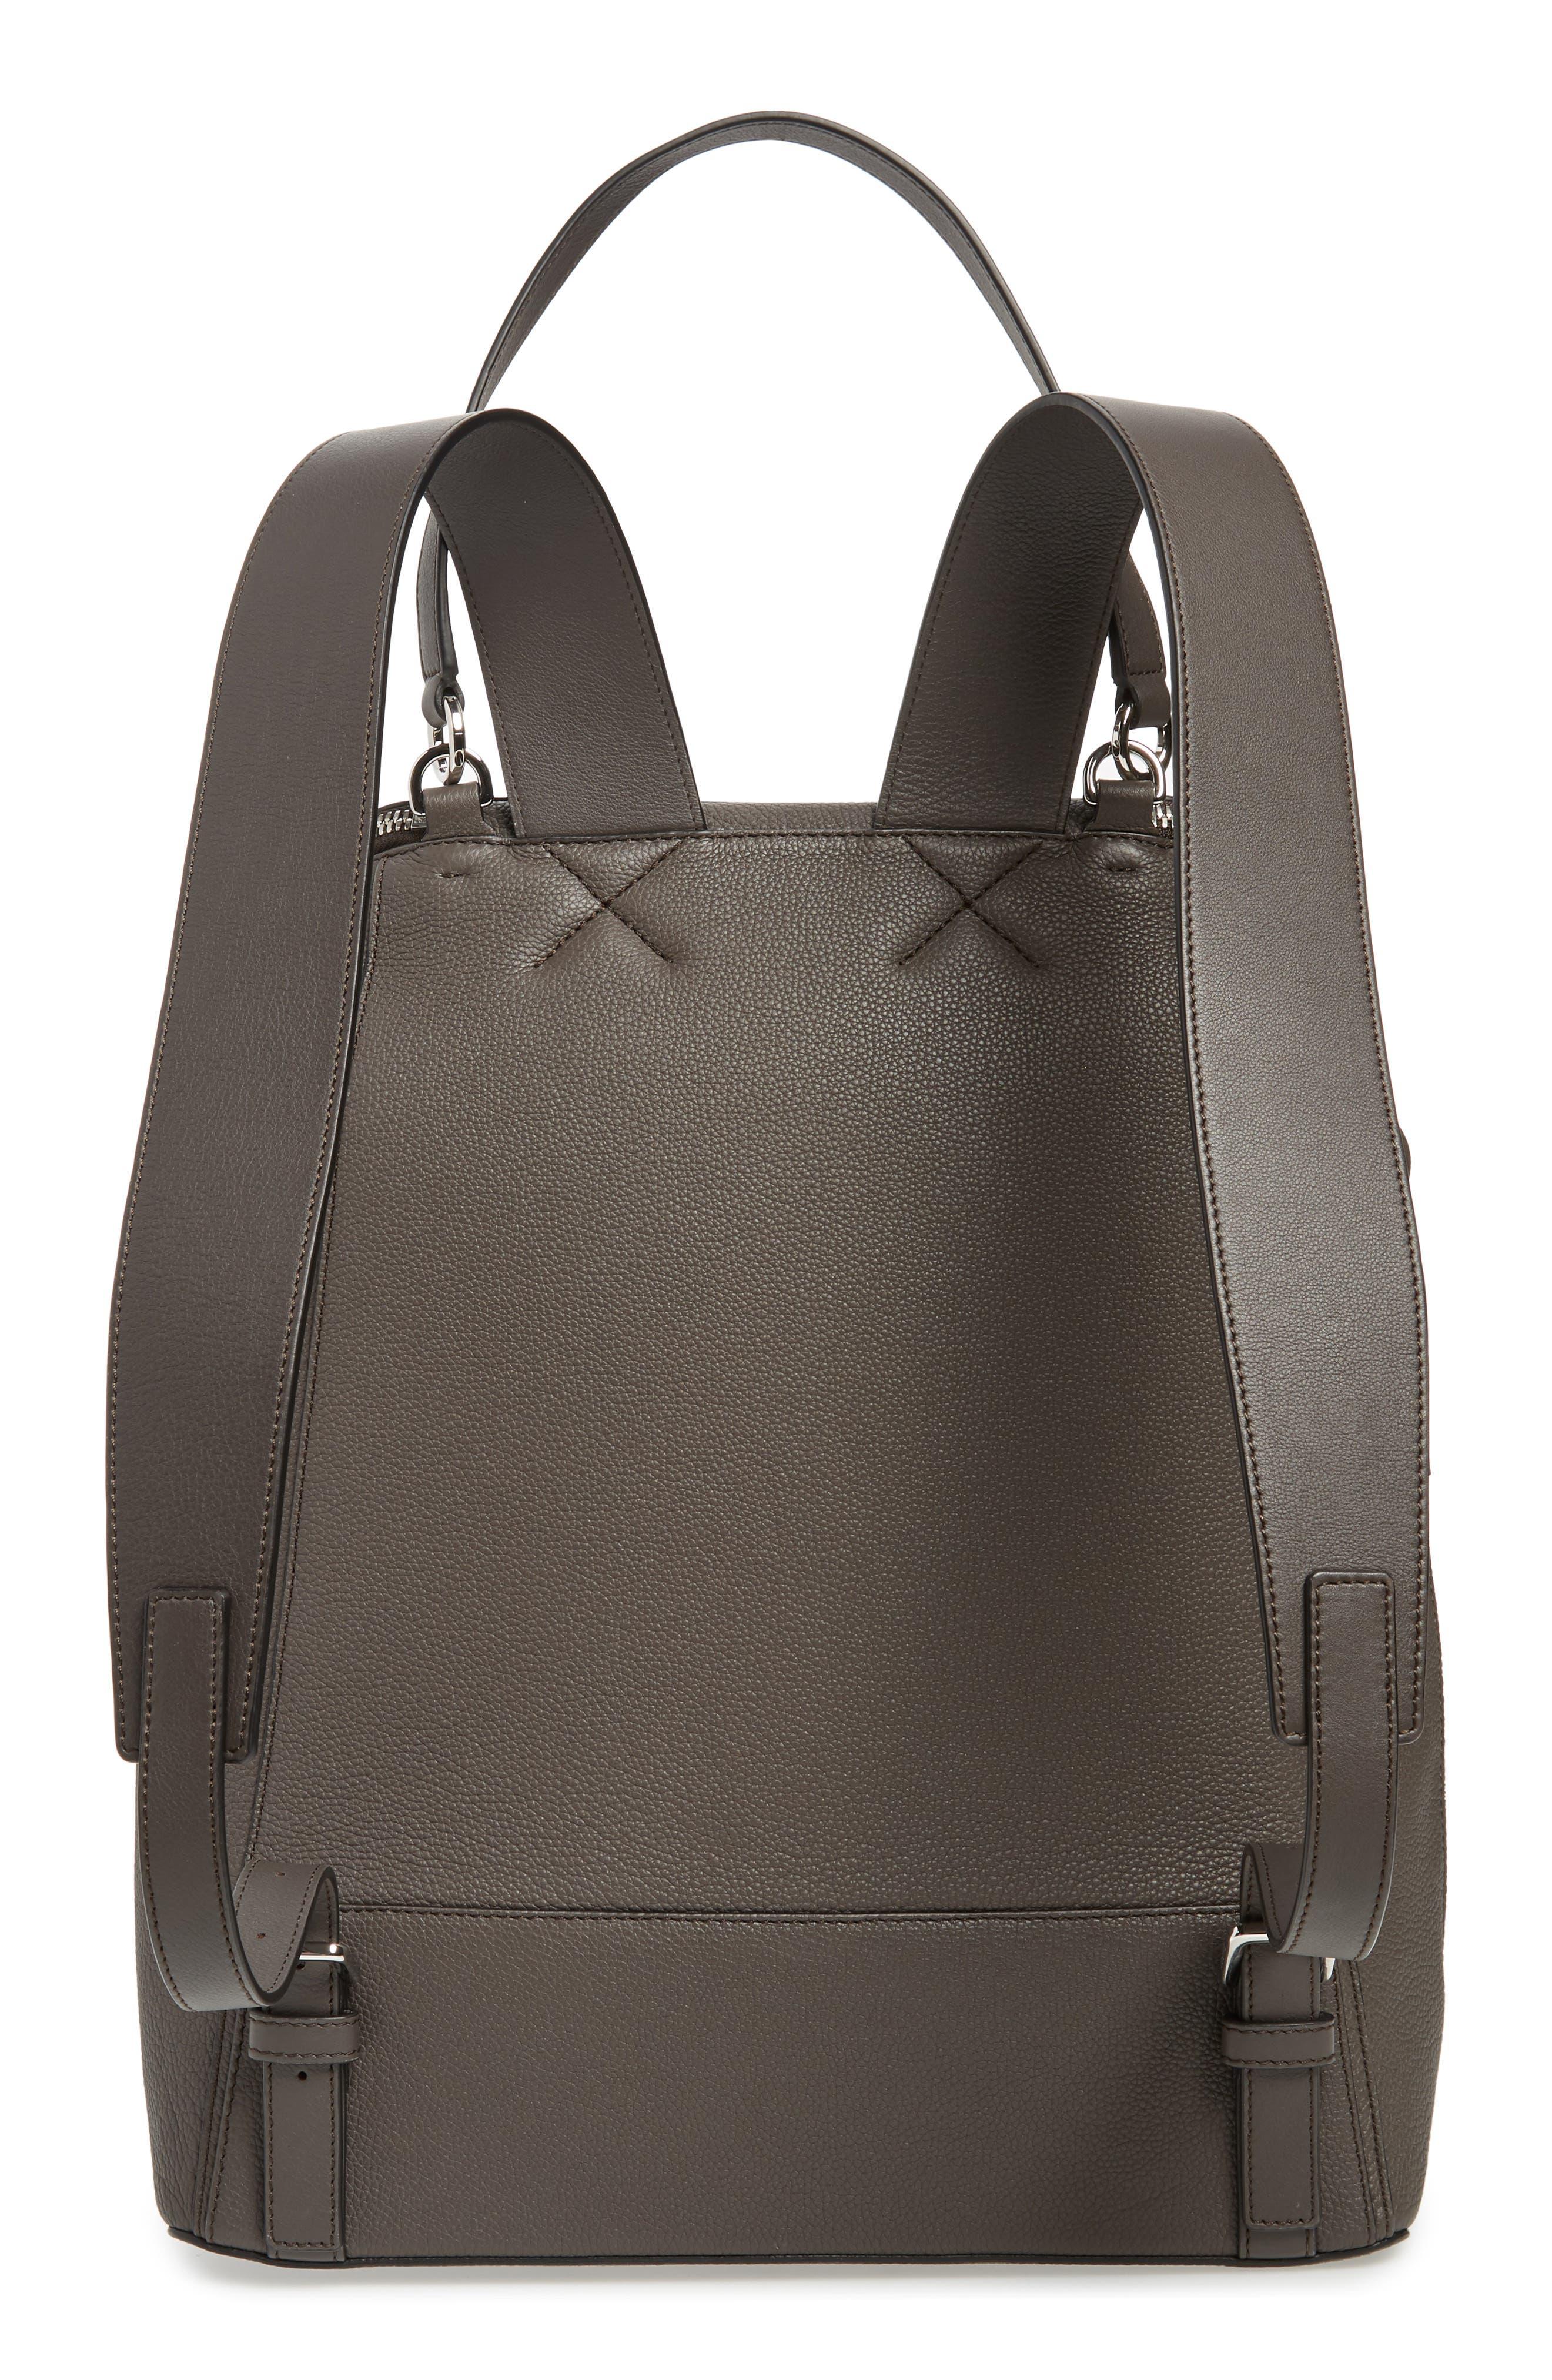 Goya Plaid Calfskin Leather Backpack,                             Alternate thumbnail 3, color,                             022